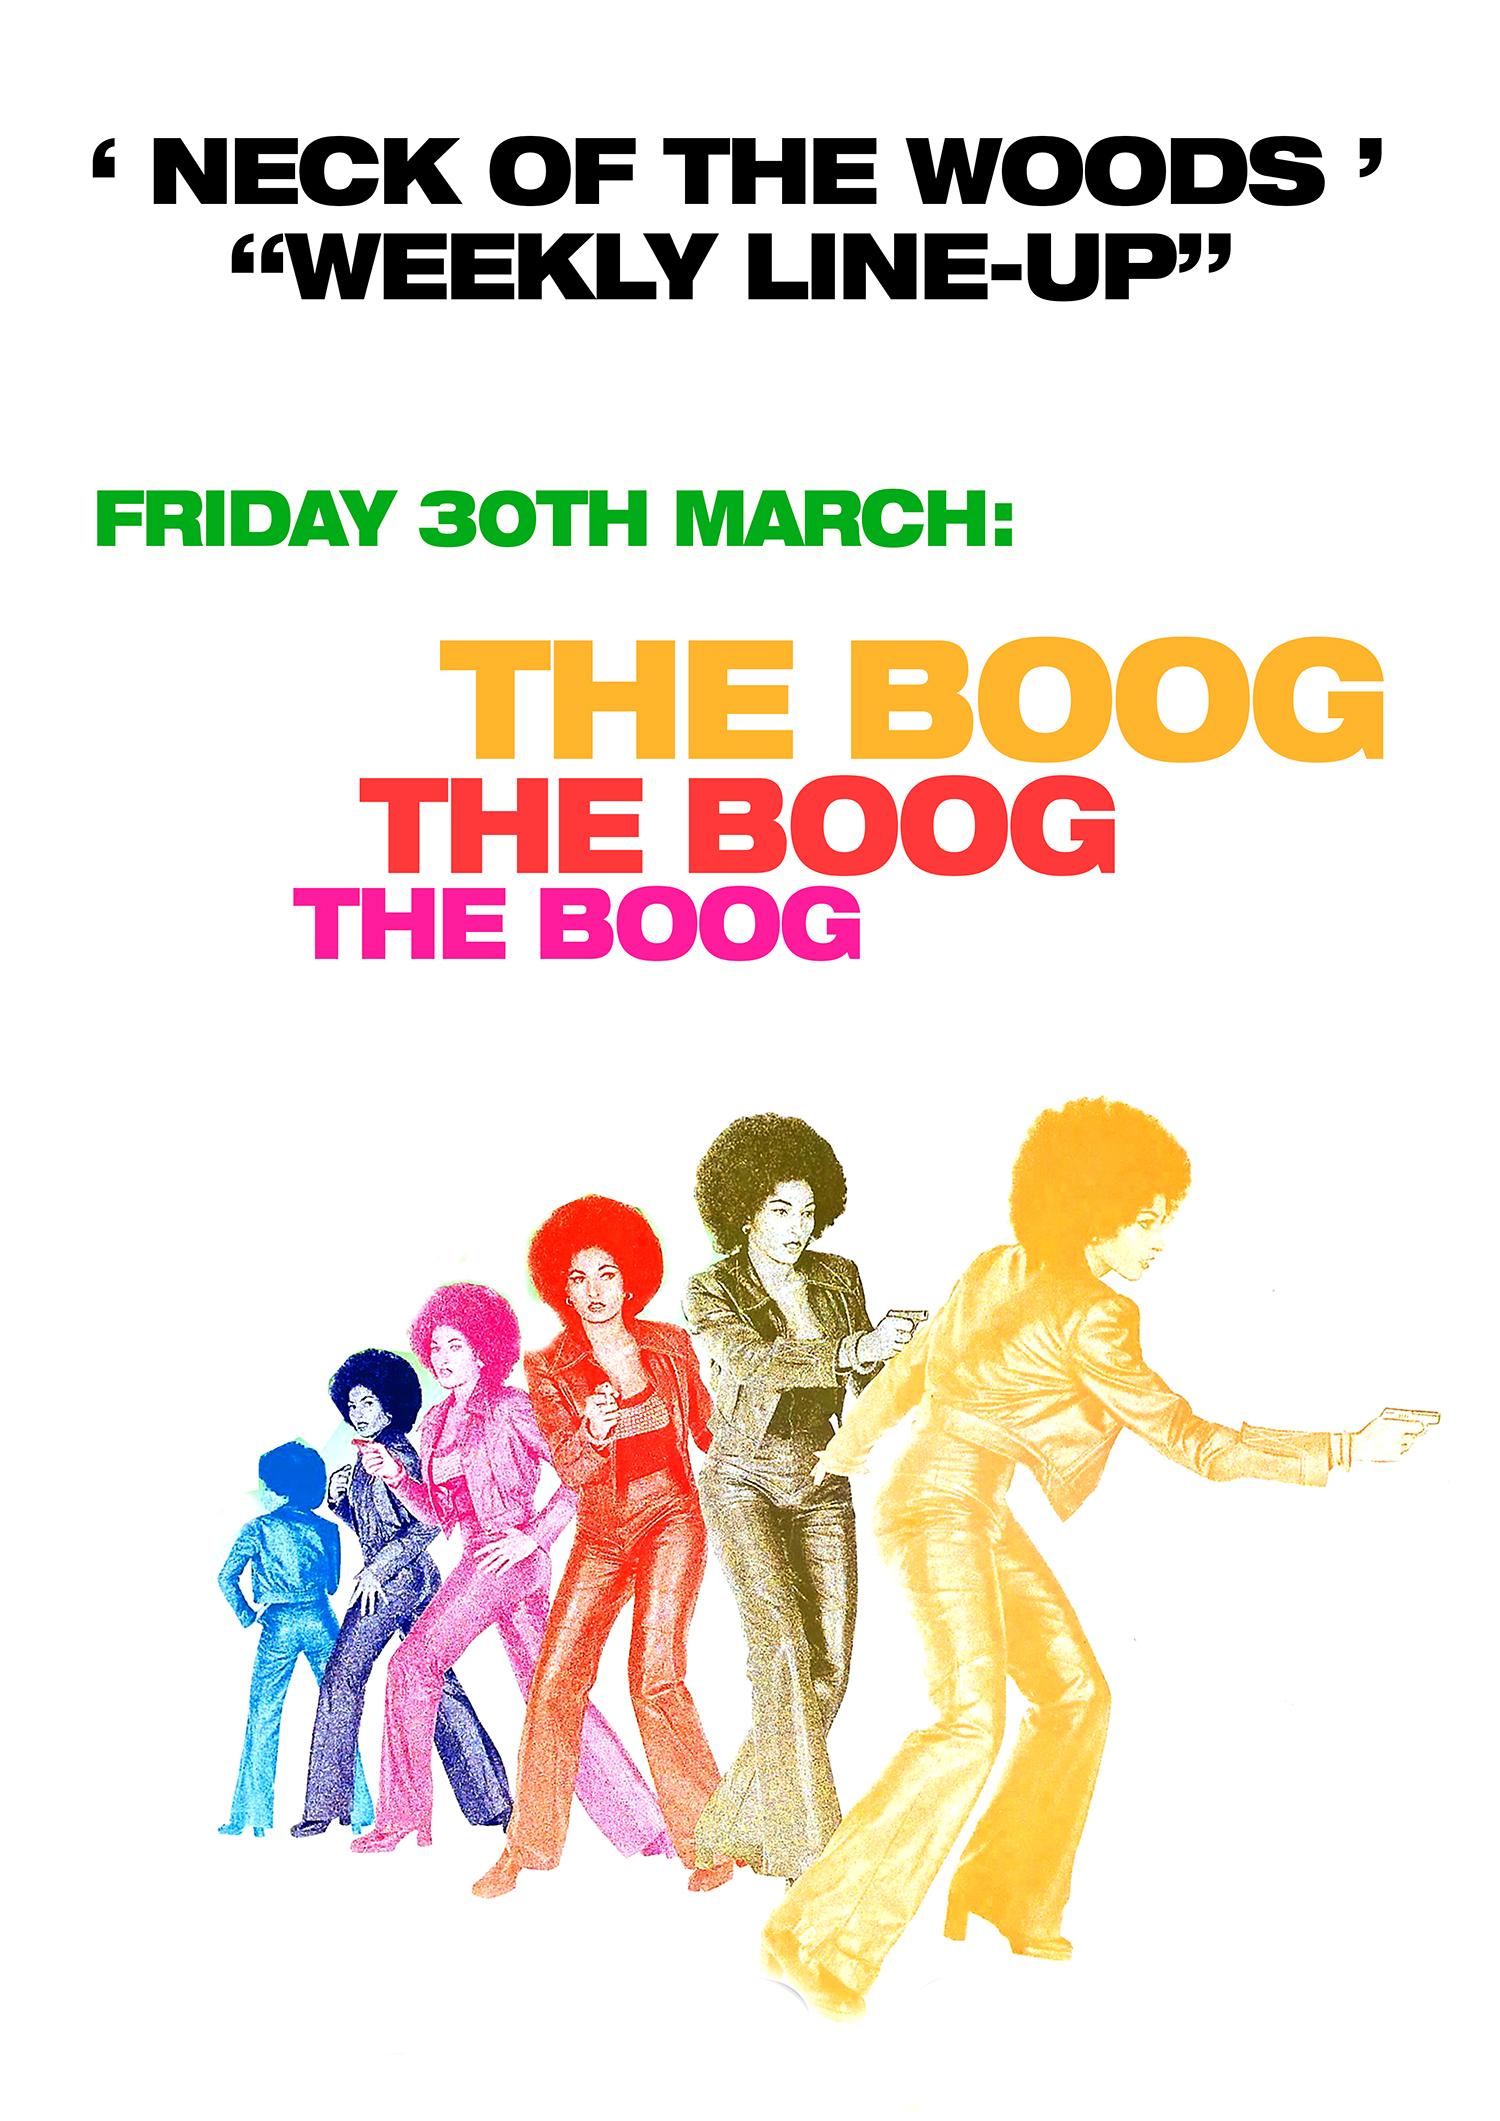 THE-BOOG-1.jpg